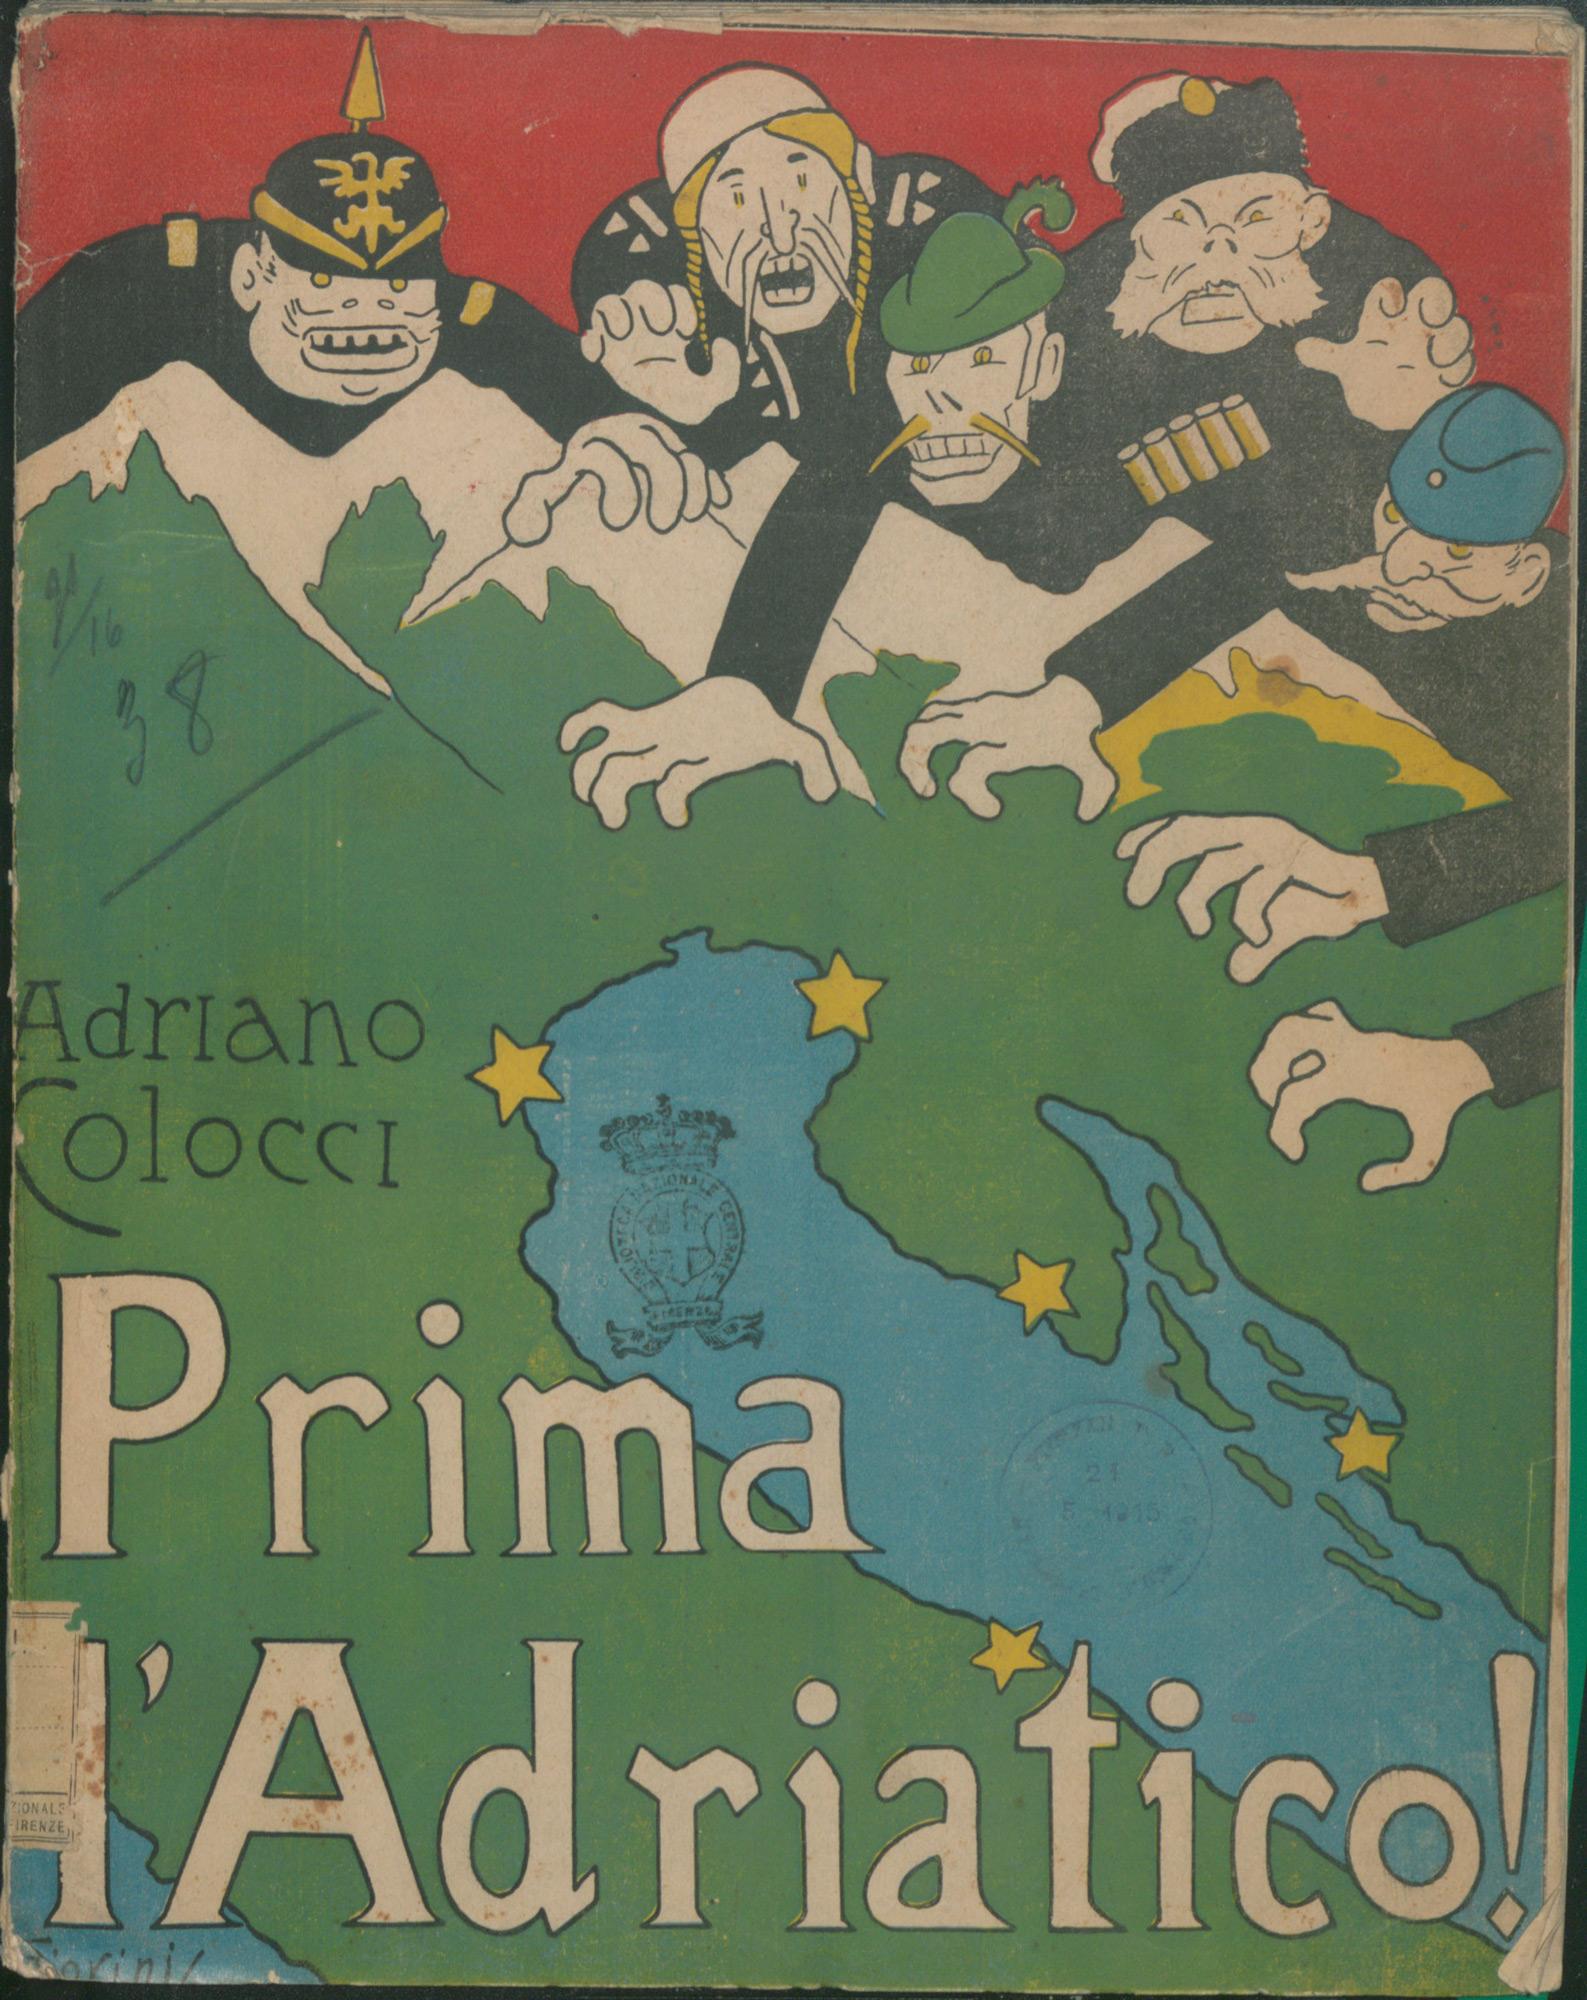 Prima l'Adriatico